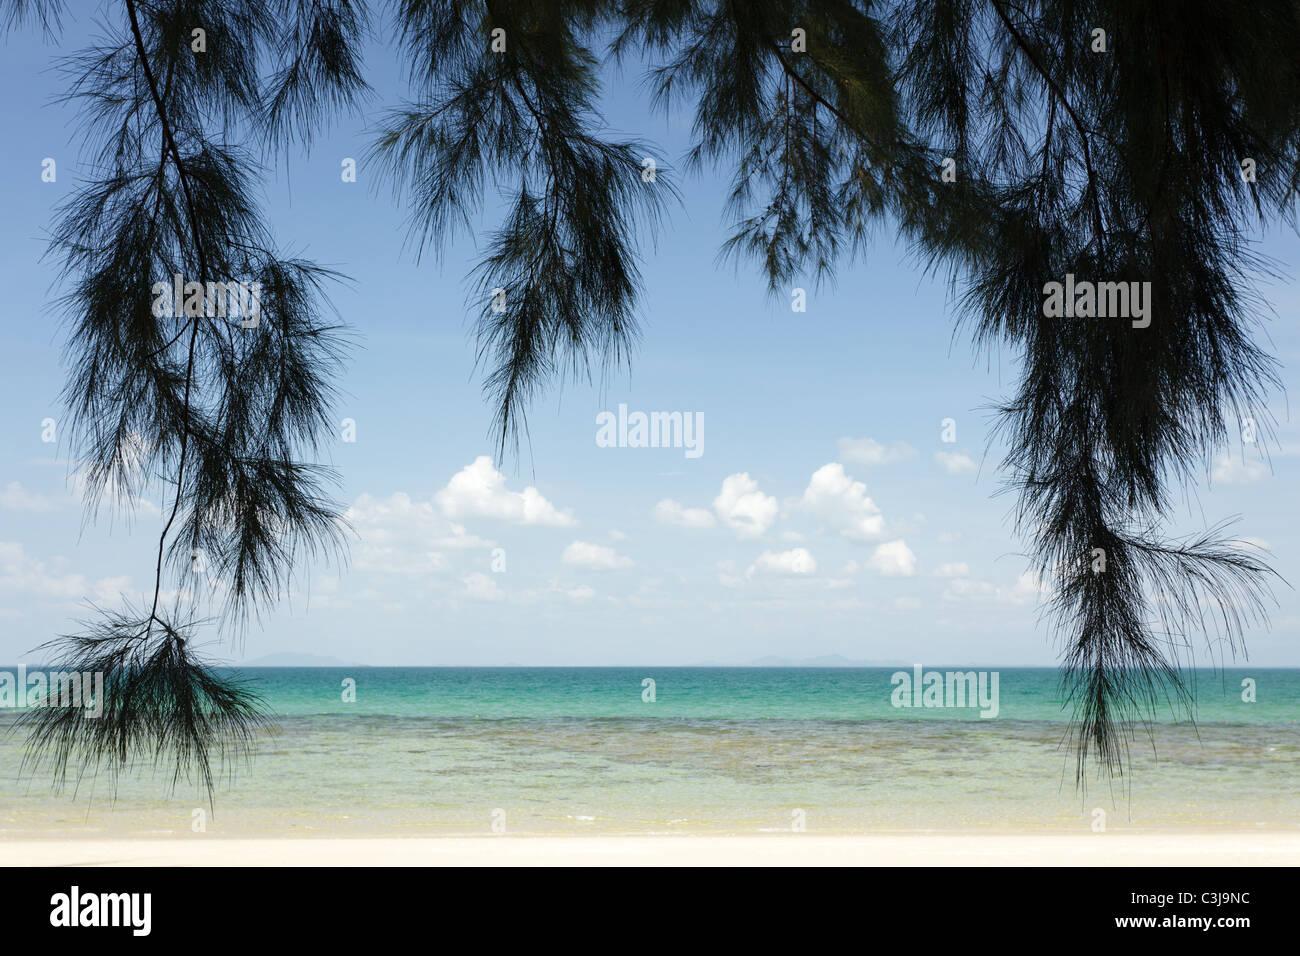 Casuarina equisetifolia filao tree in tropical beach, ko laoliang island, thailand - Stock Image